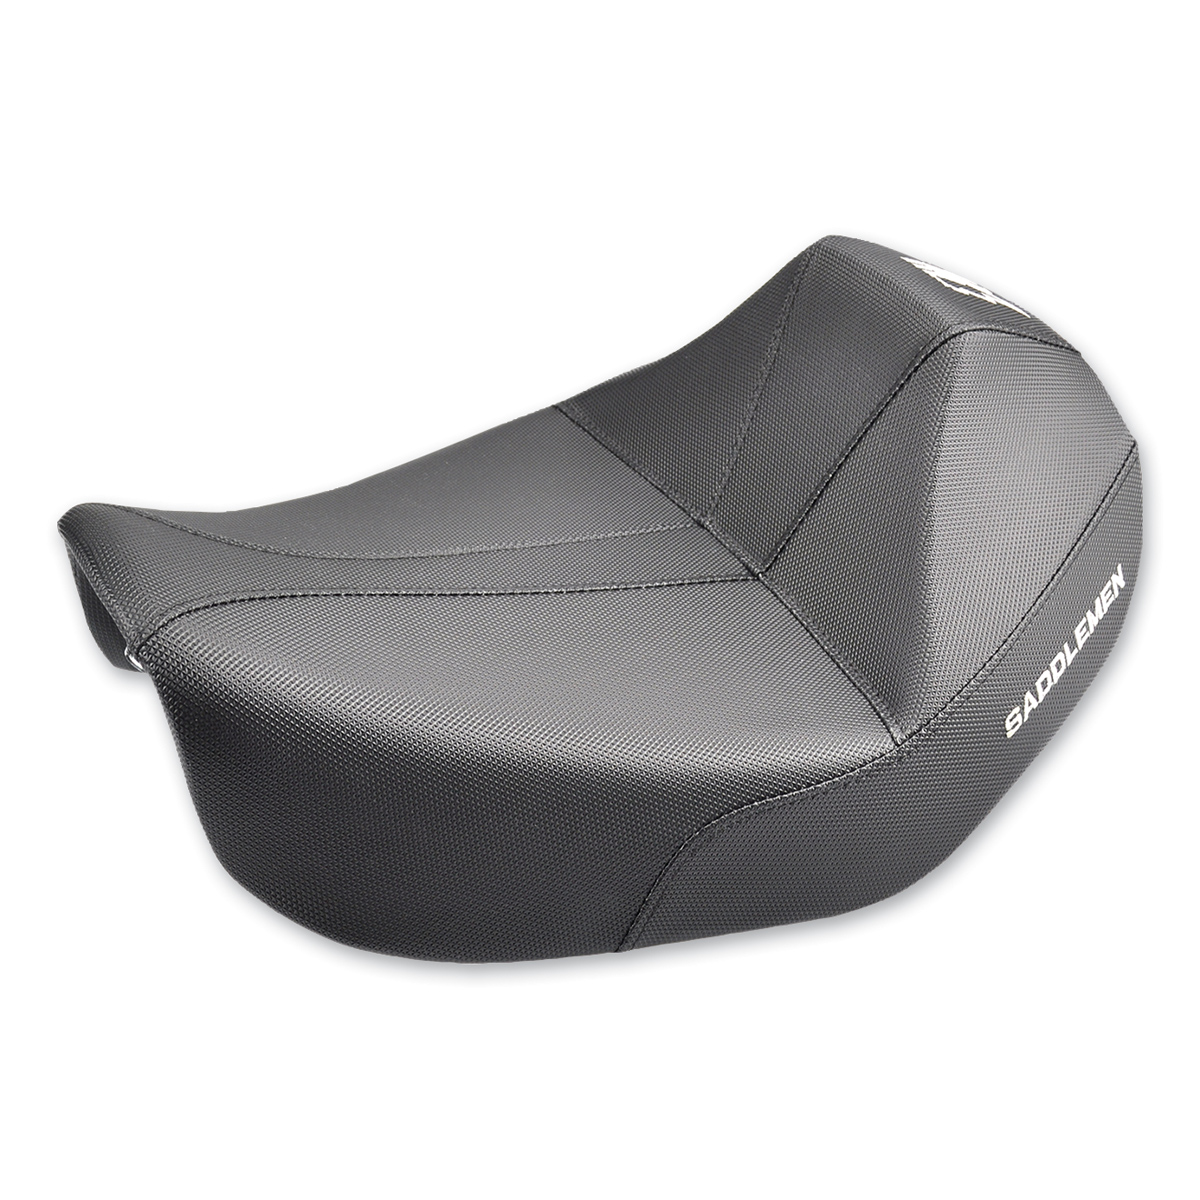 Saddlemen 1 Wheel Revolution Performance Gripper Solo Seat